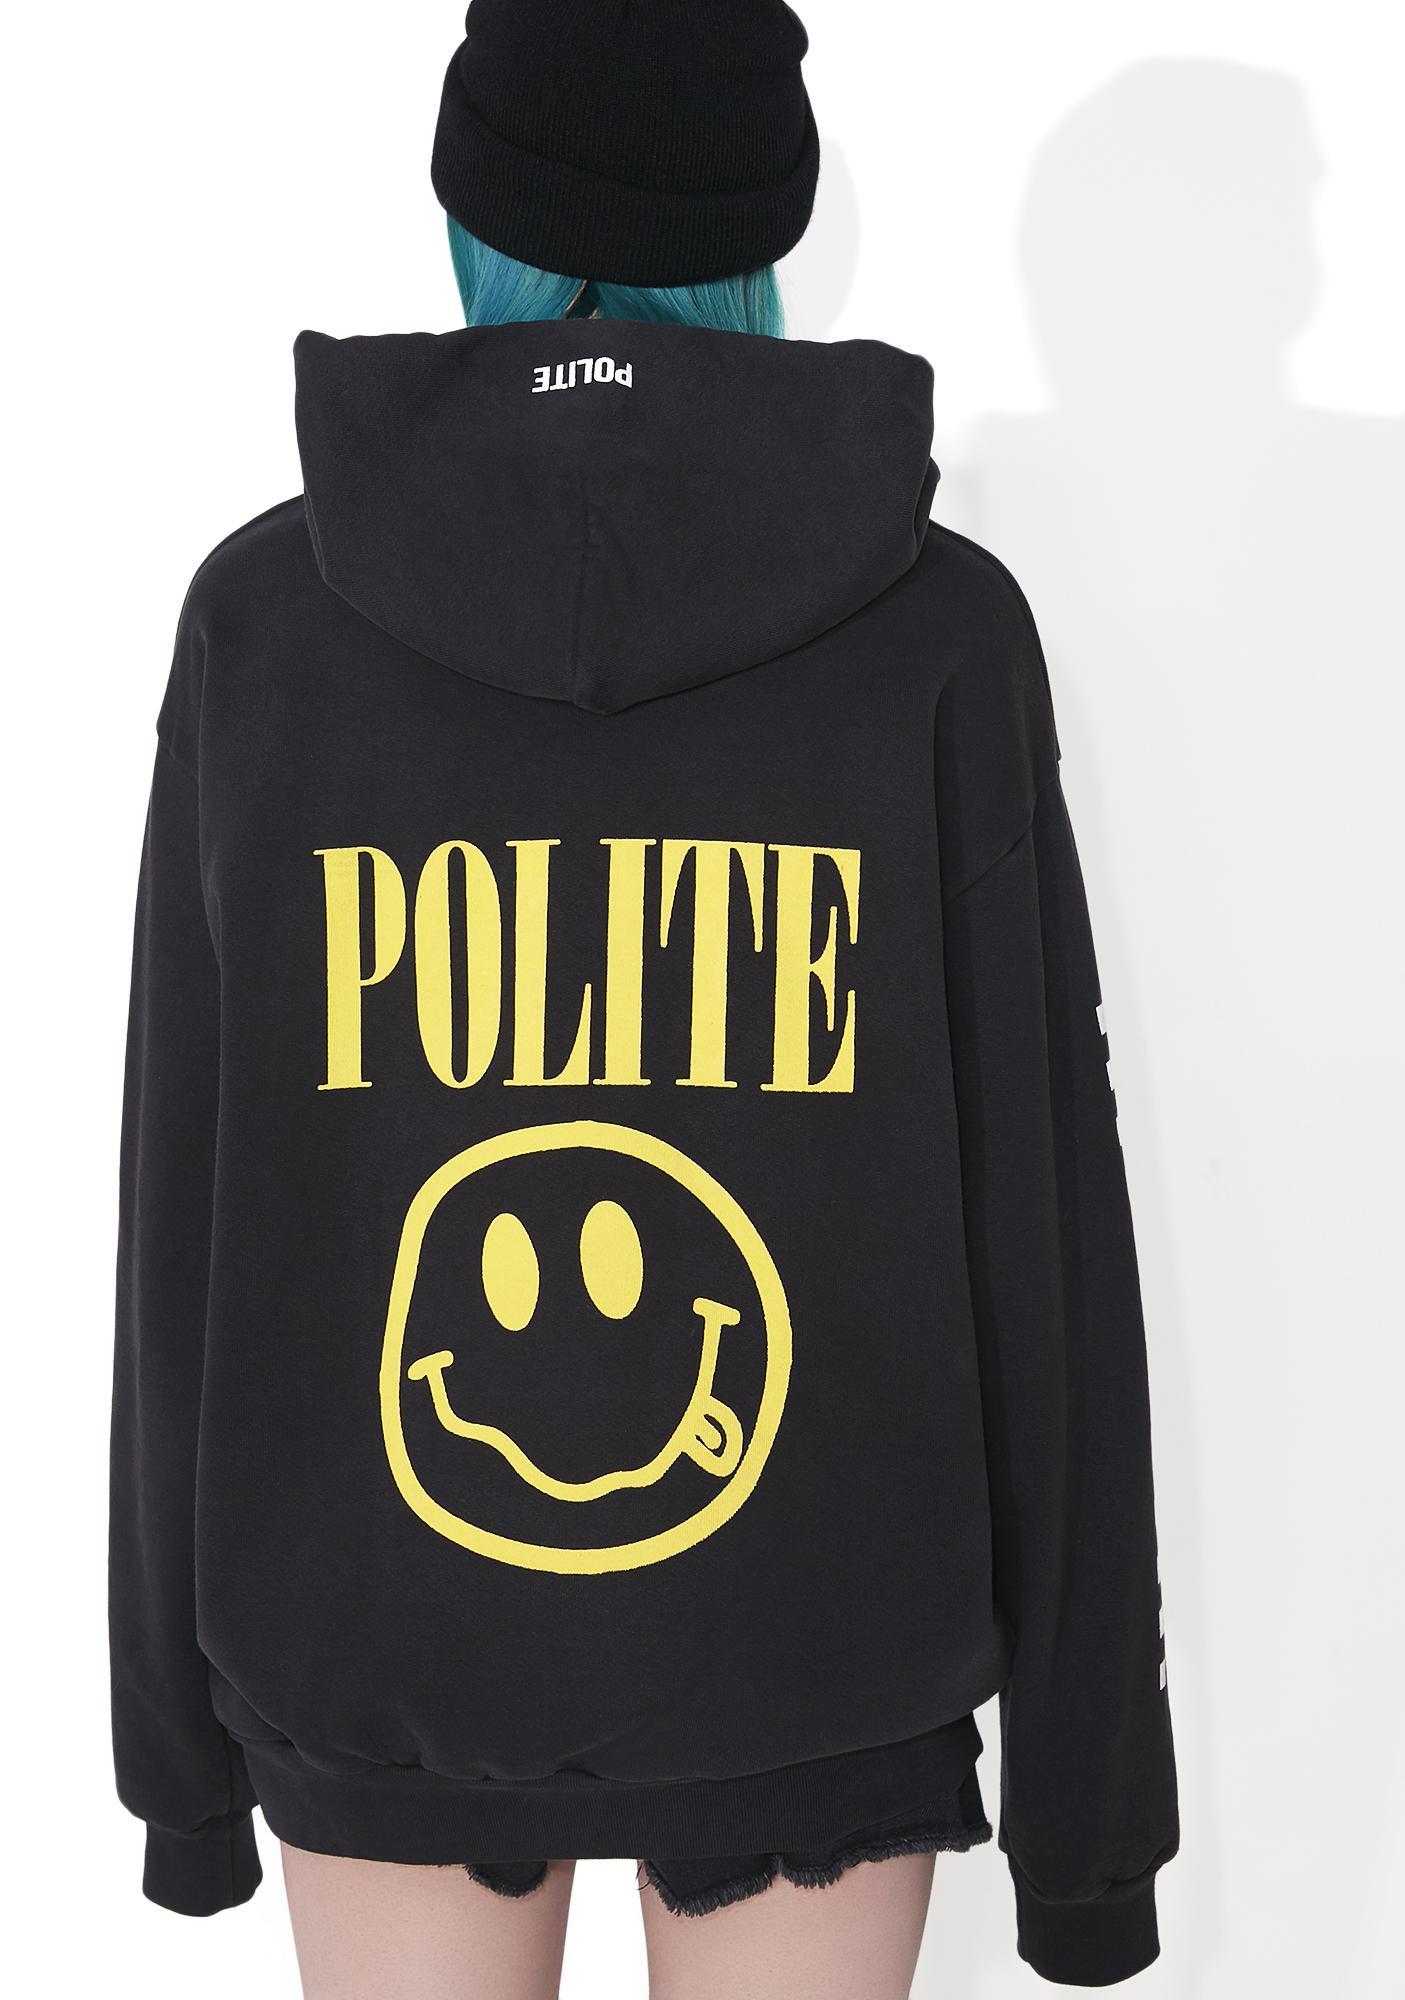 Polite Smiley Pullover Hoodie